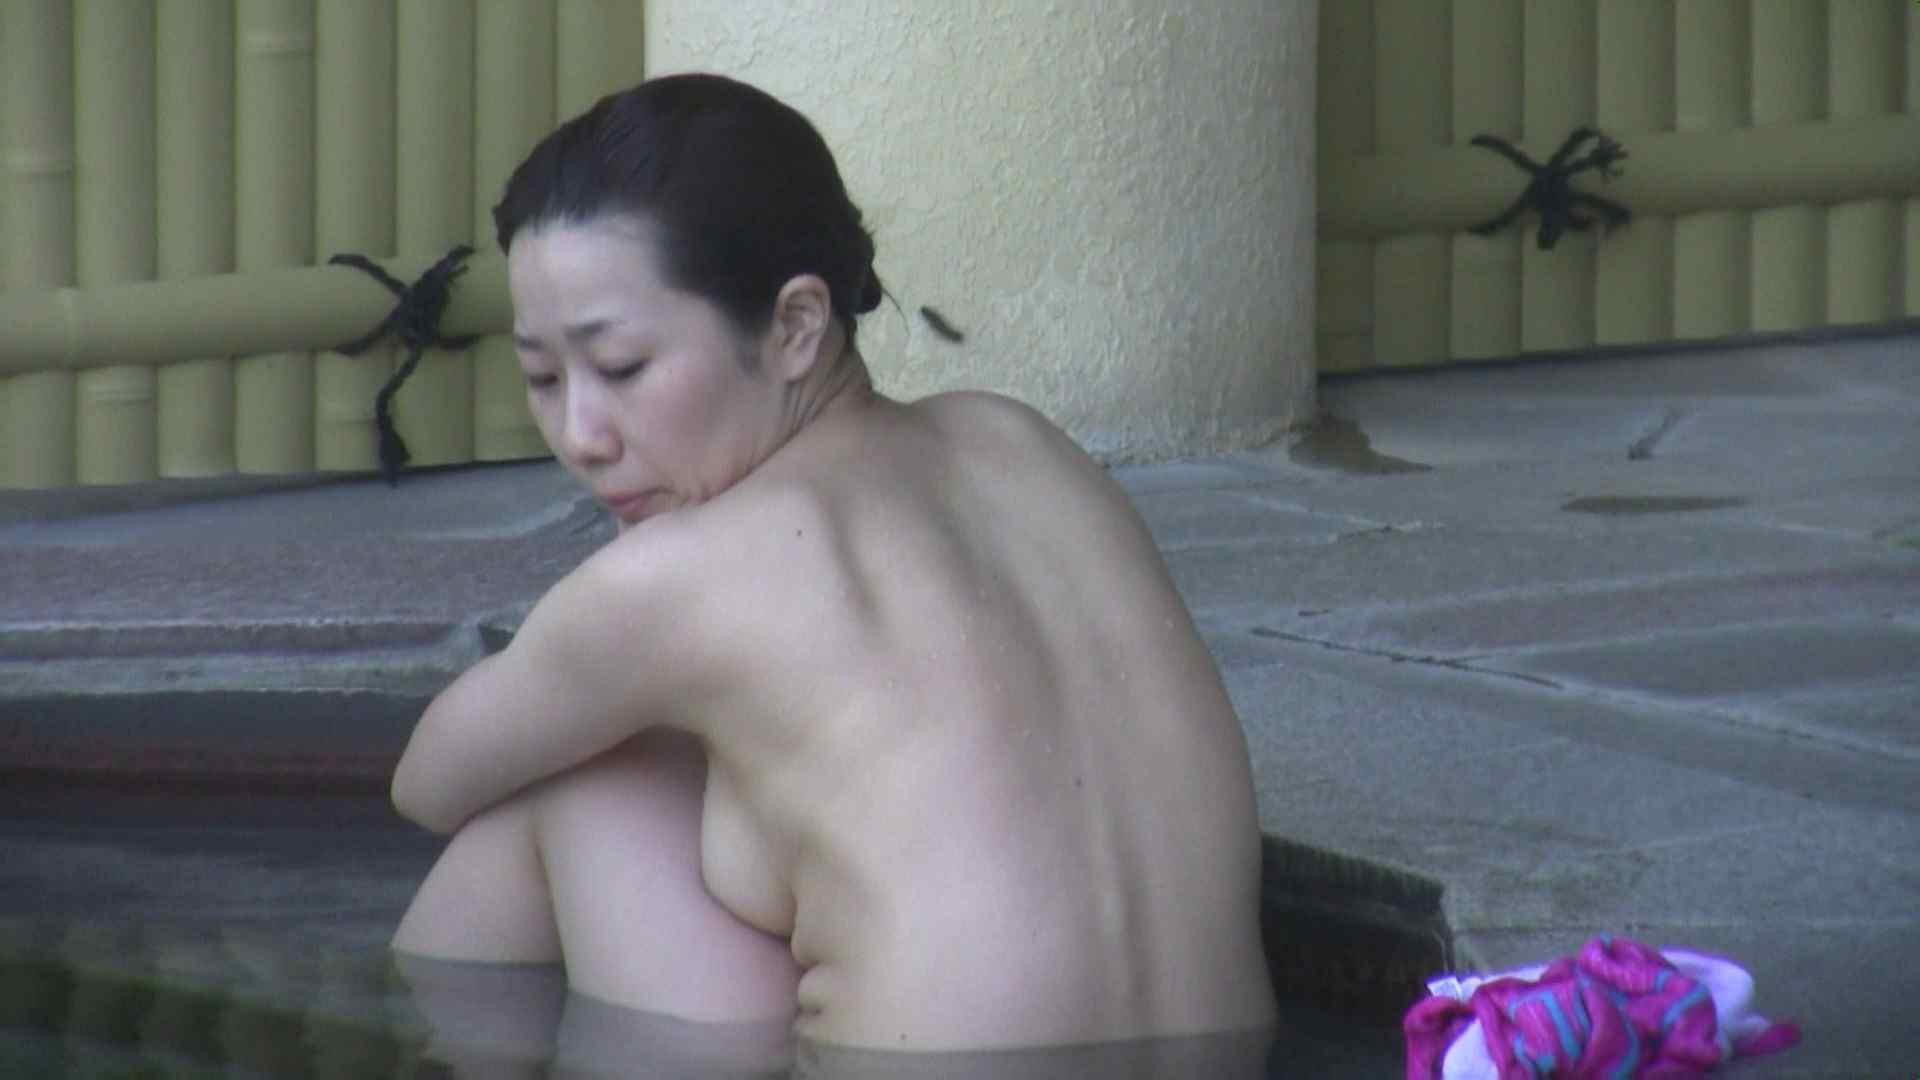 Aquaな露天風呂Vol.88【VIP限定】 OLのエロ生活 | 露天風呂  61連発 7